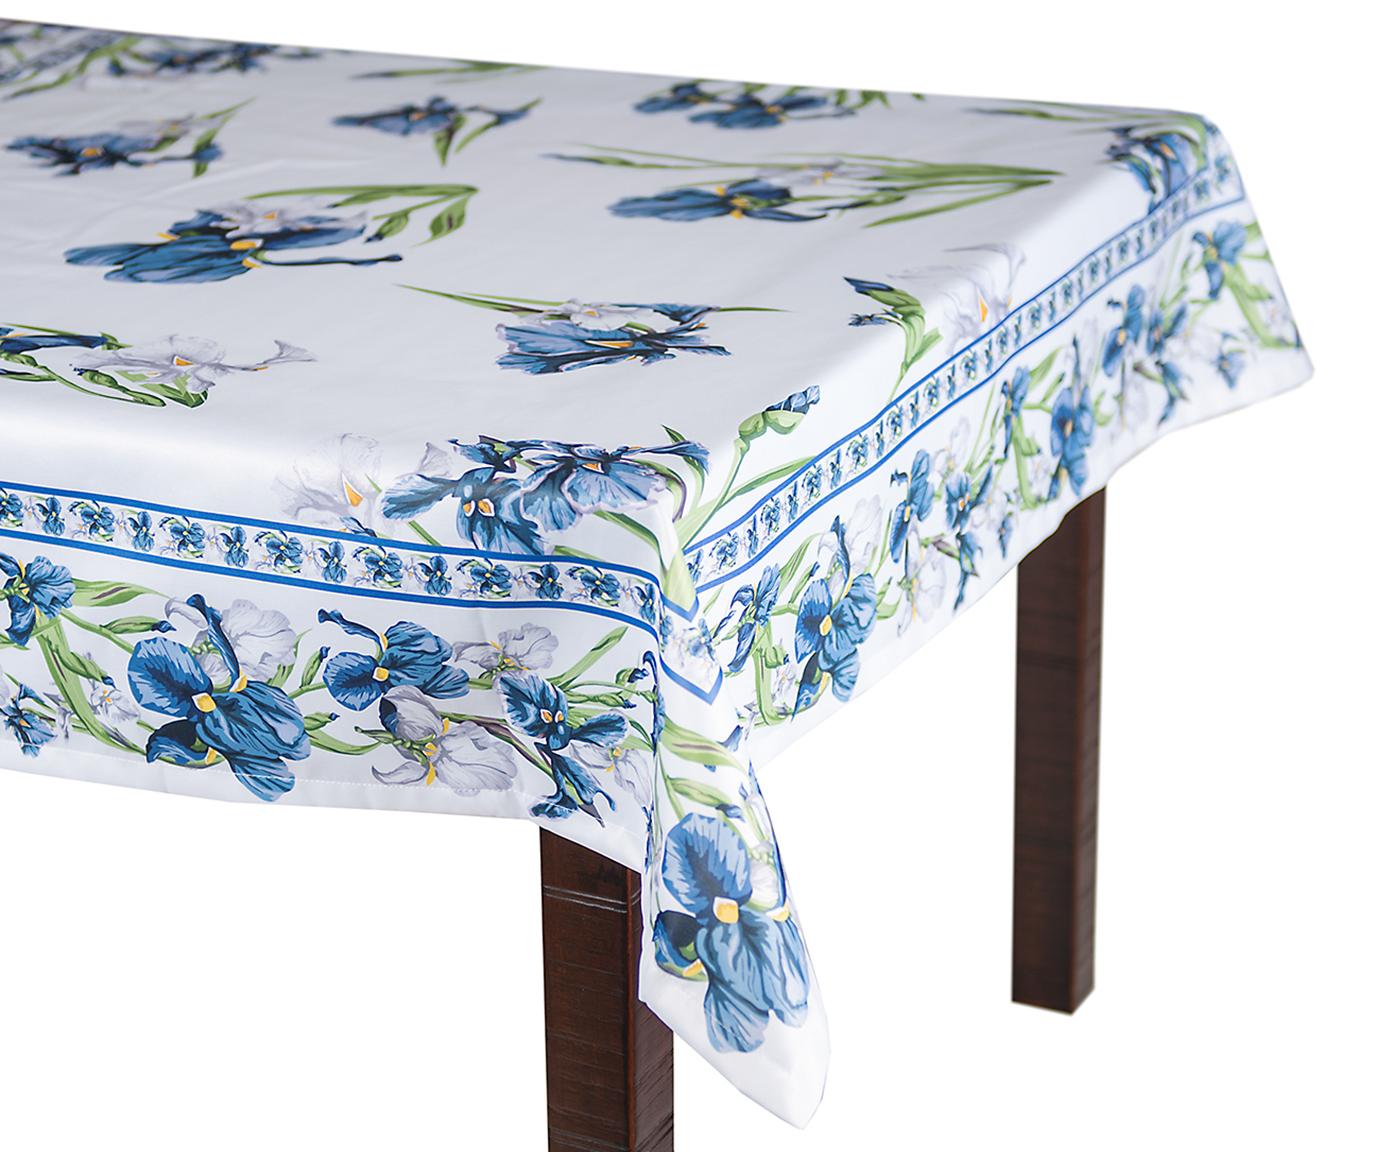 Кухня Скатерть 140x220 Blonder Home Iris синяя skatert-140x220-blonder-home-iris-sinyaya-ssha-rossiya.jpg